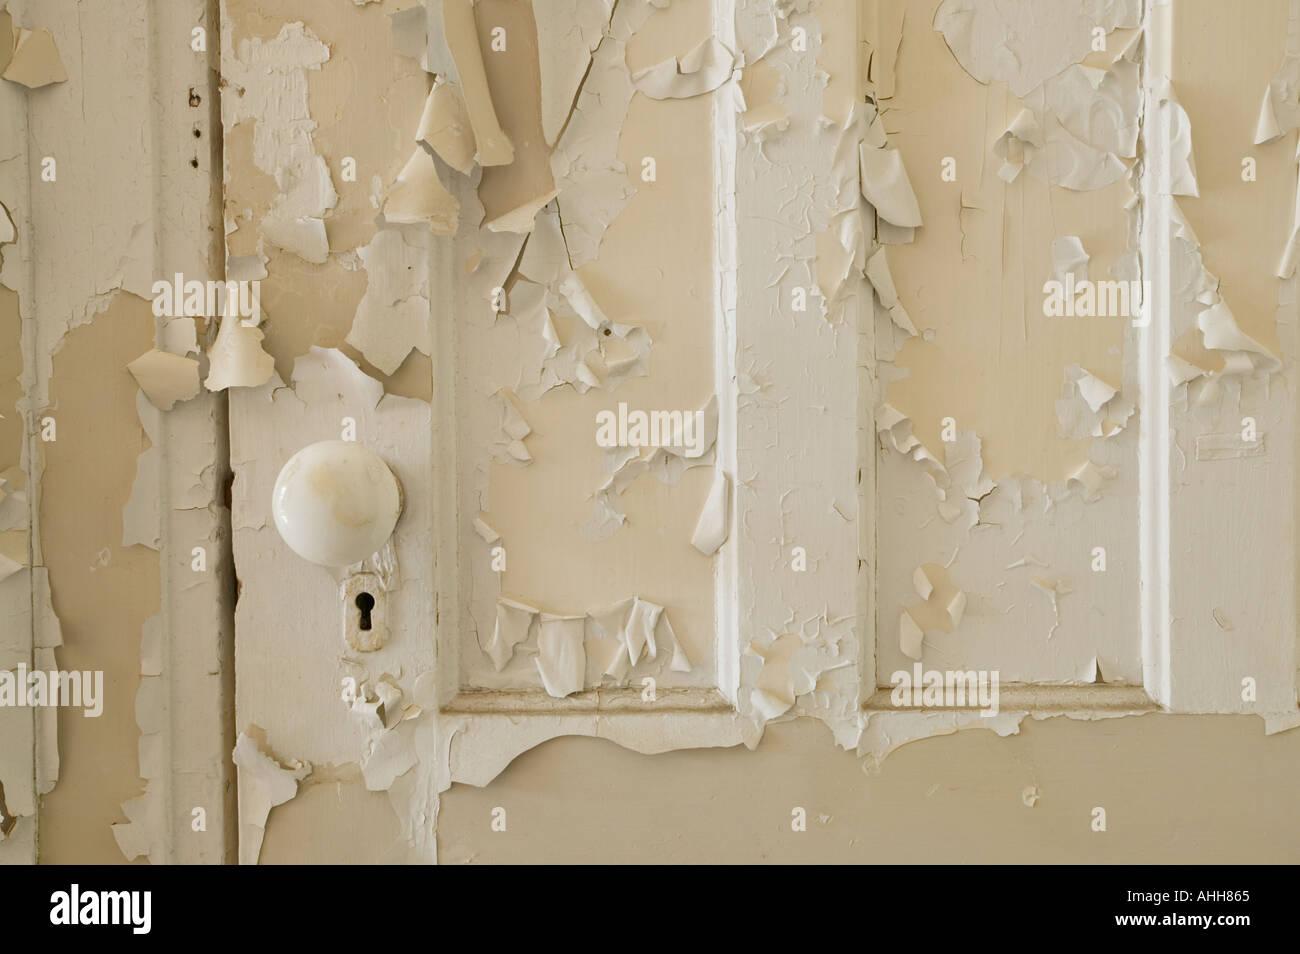 Peeling paint on a door - Stock Image